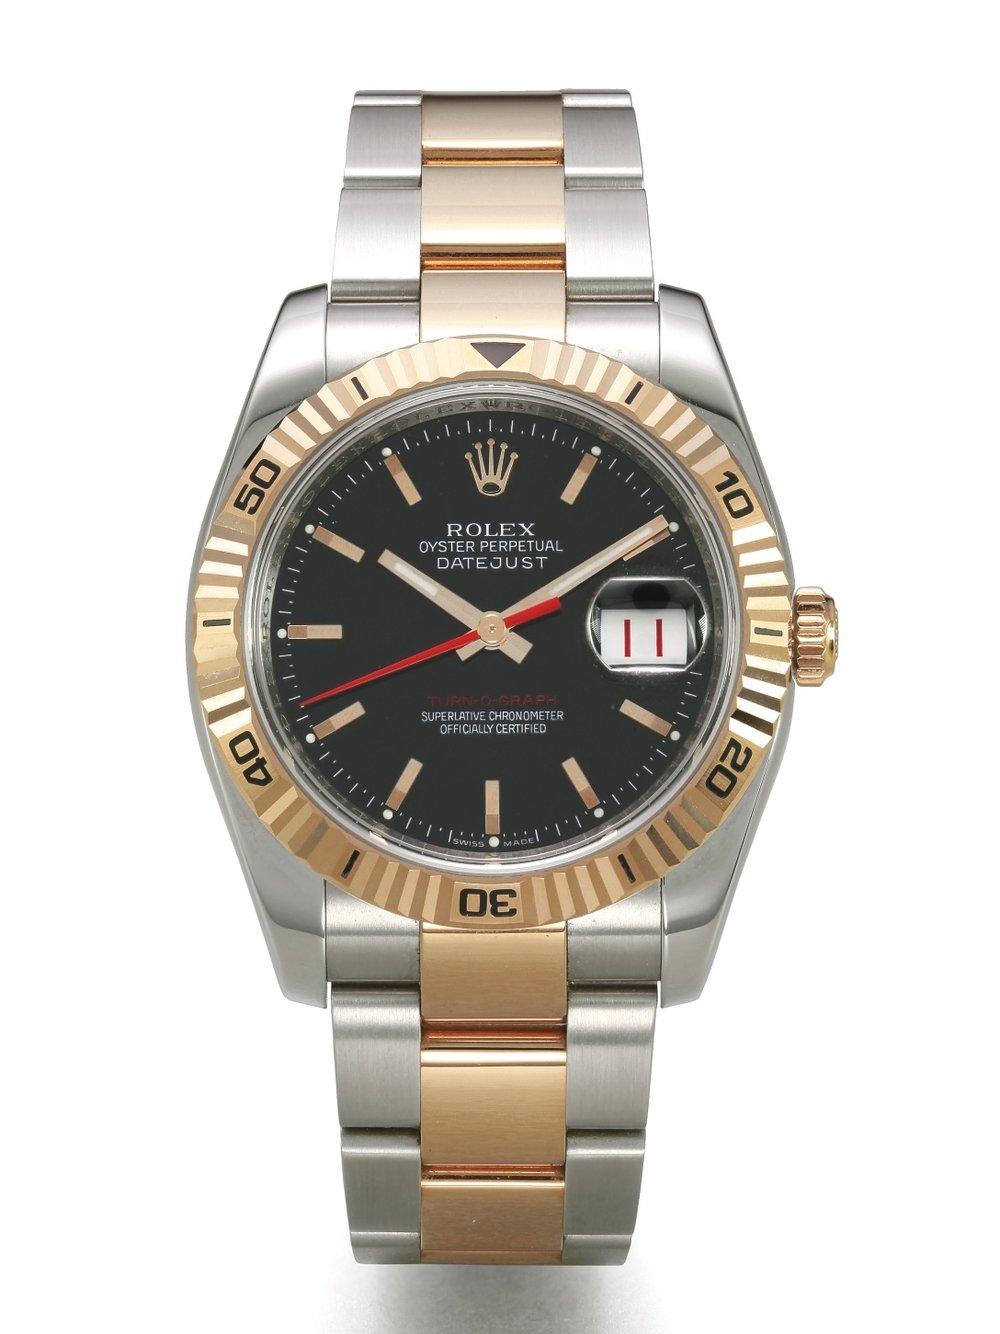 Rolex Datejust Turn-o-graph Ref. 116263.